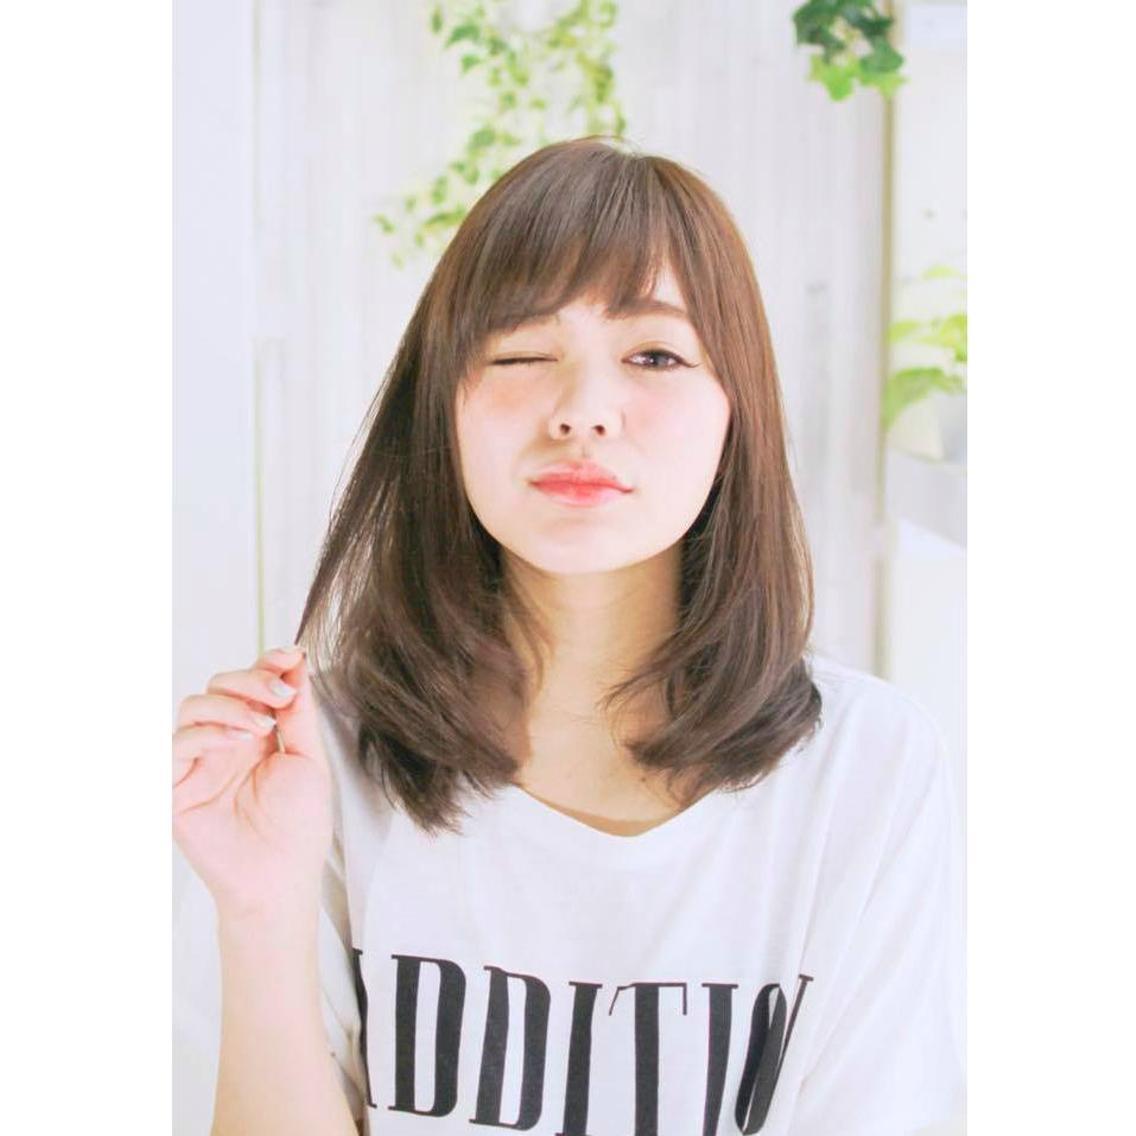 ZU-LU 稲田堤店所属・ZU-LU 稲田堤店(C)の掲載